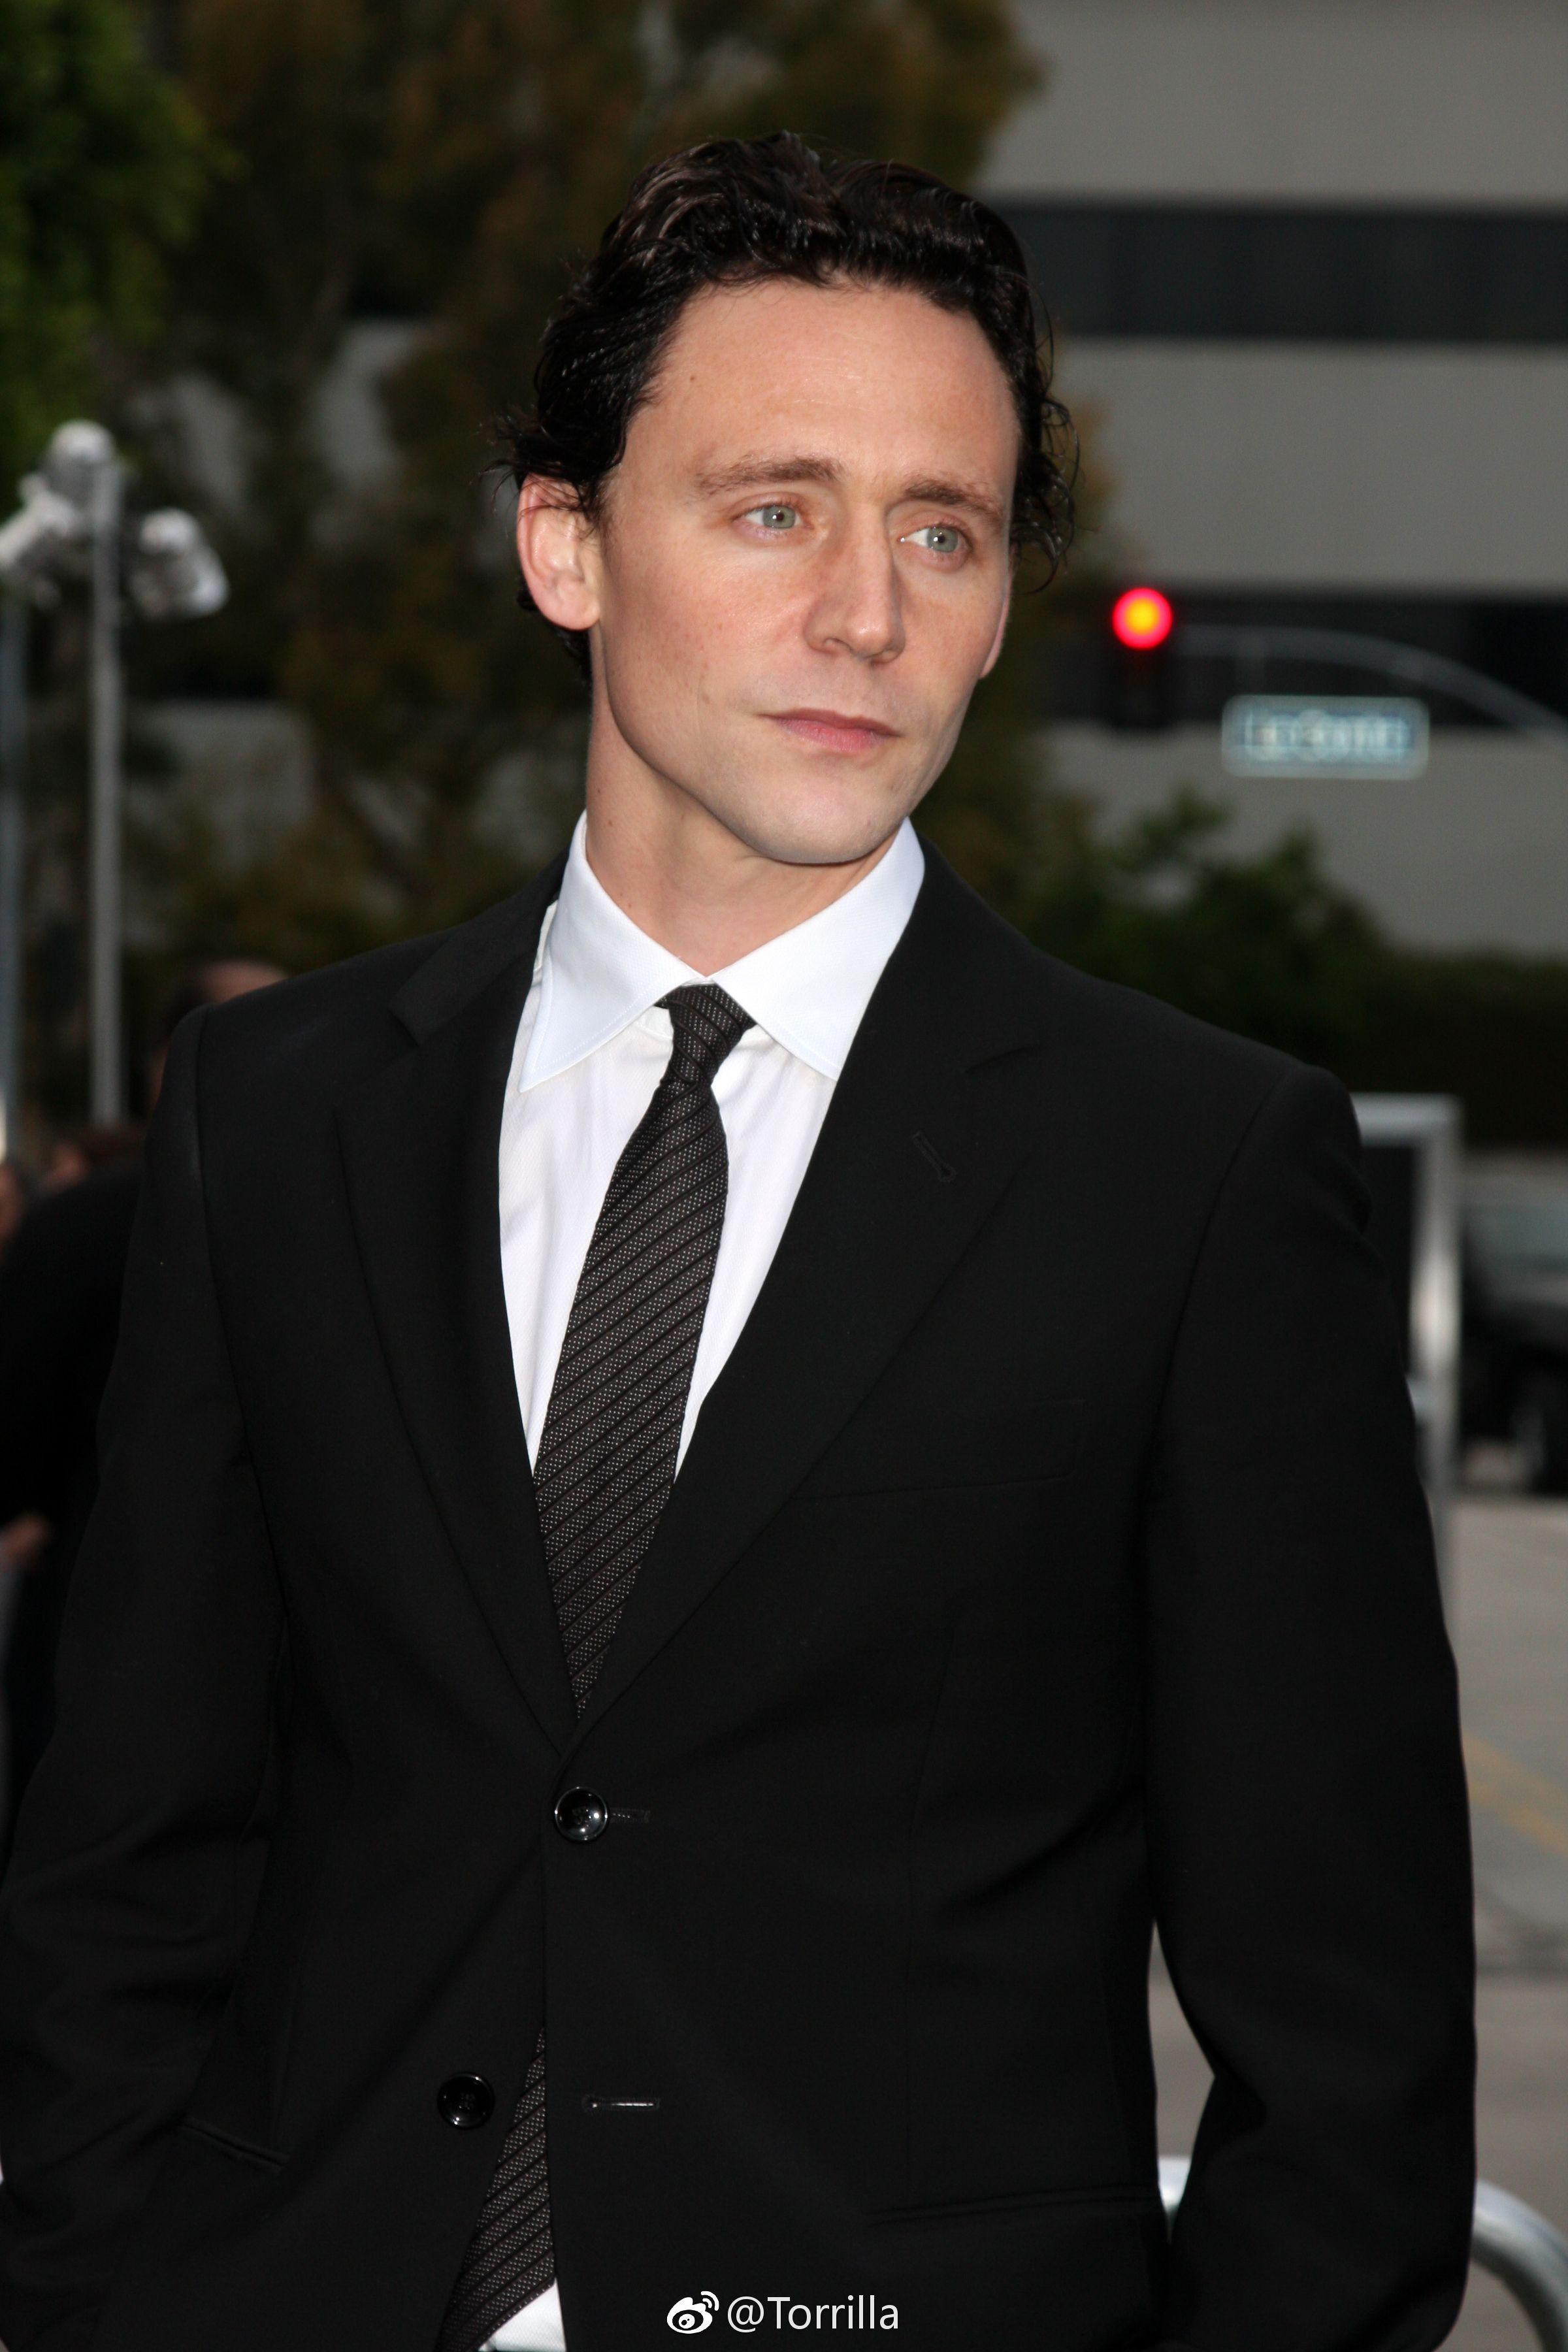 Tom Hiddleston Attends The Super 8 Los Angeles Premiere On June 8 2011 Hot British Men Actors Tom Hiddleston